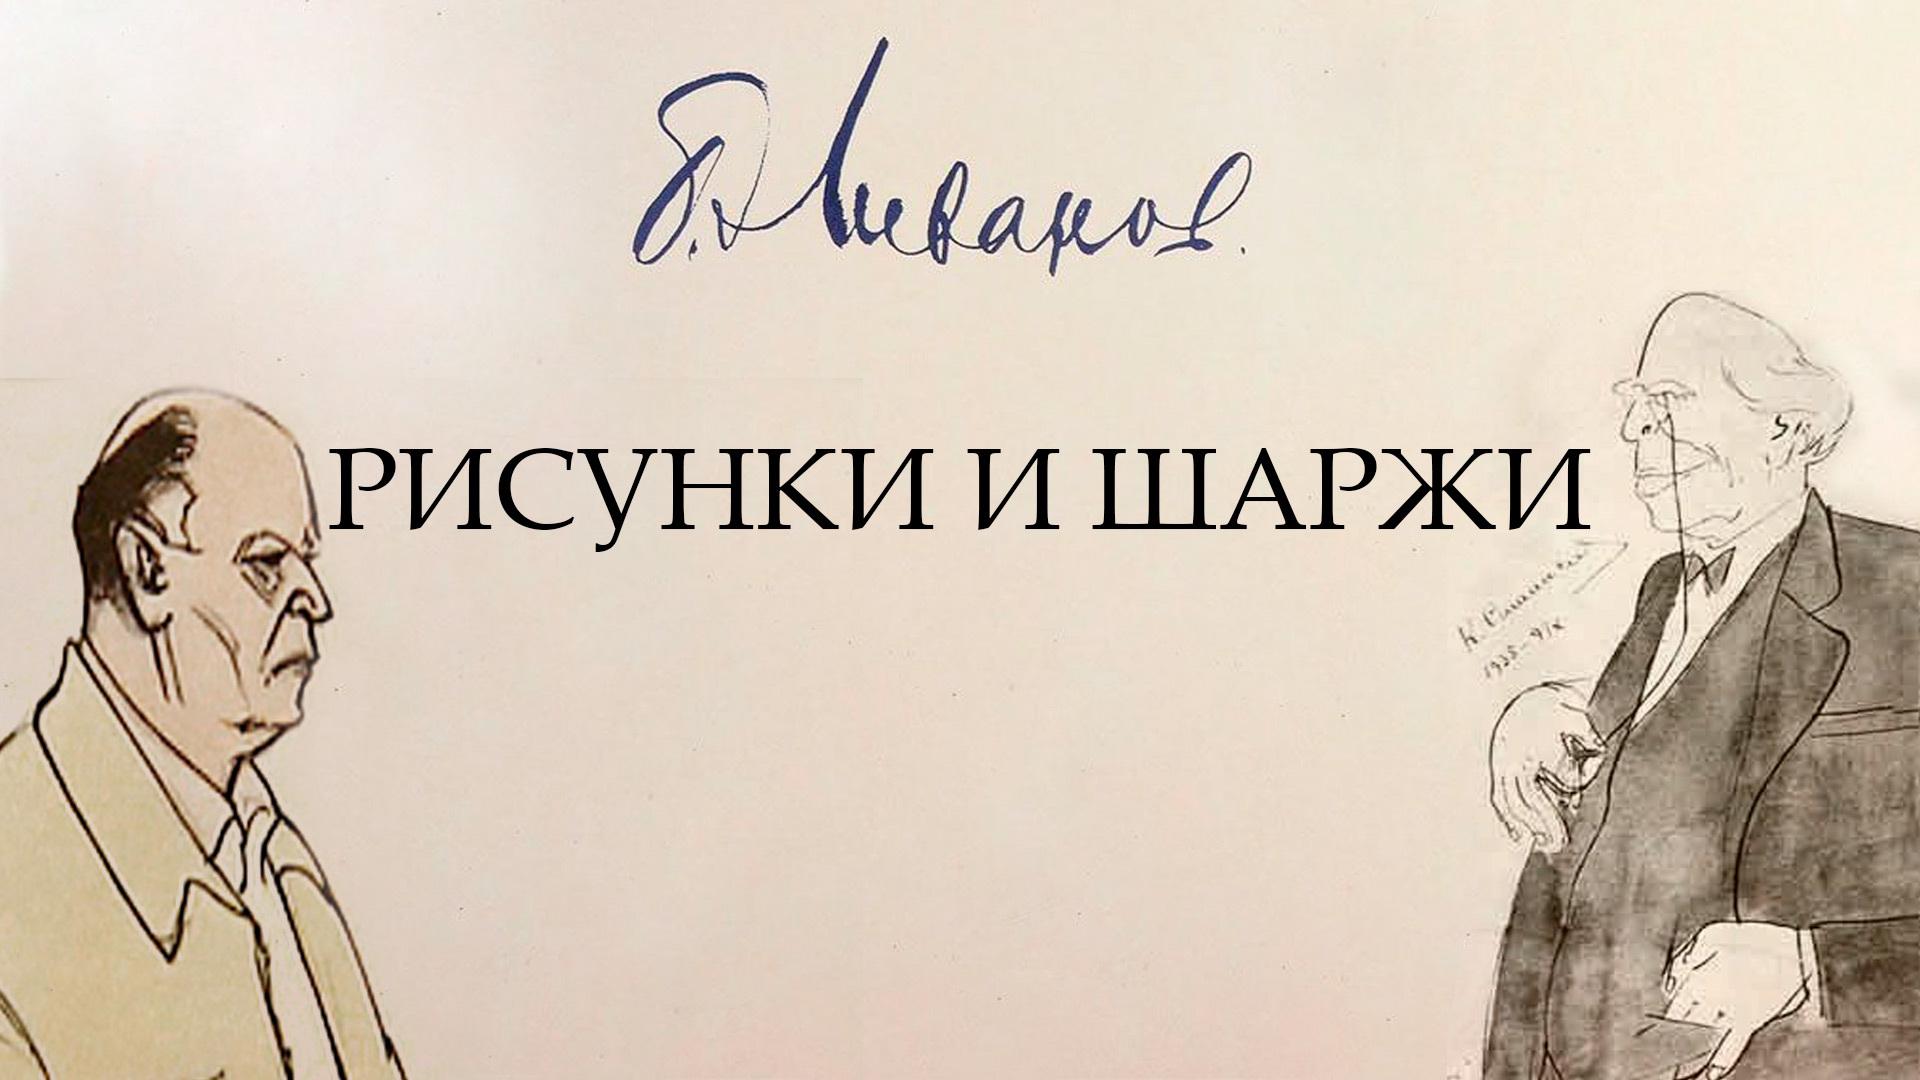 Рисунки и шаржи. Борис Ливанов